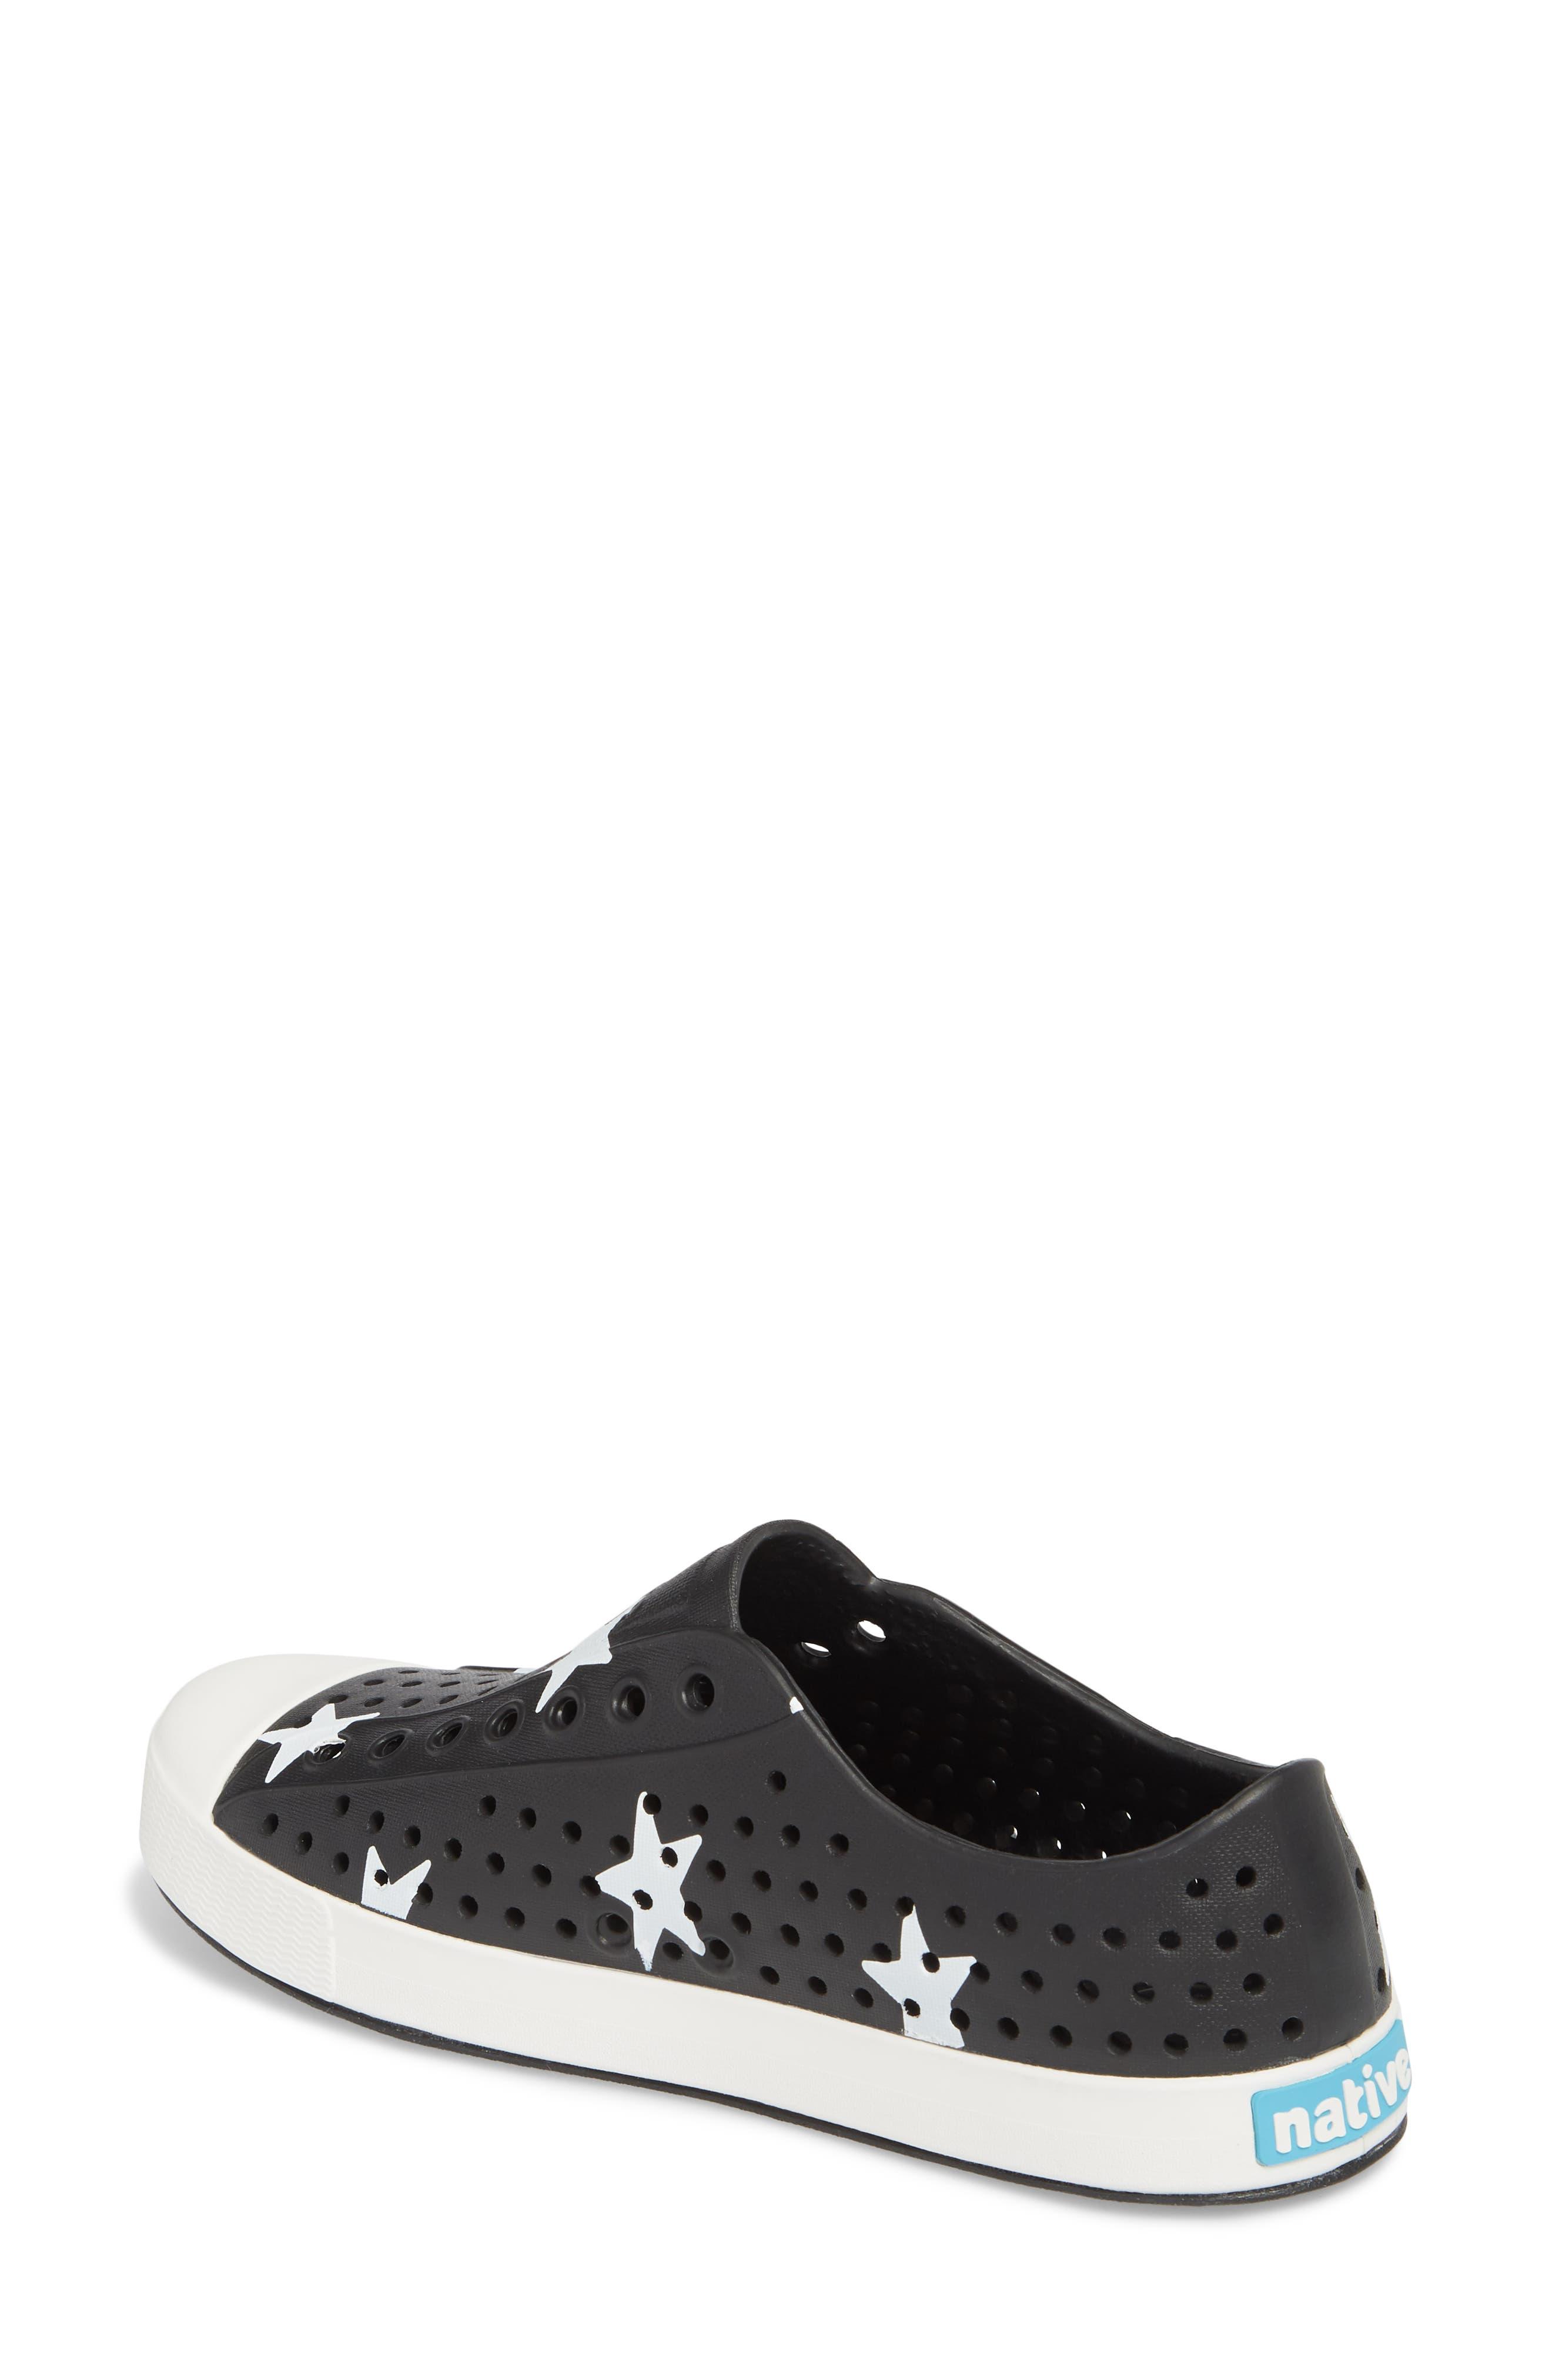 'Jefferson' Printed Slip-On Sneaker,                             Alternate thumbnail 2, color,                             Jiffy Black/ White/ Big Star